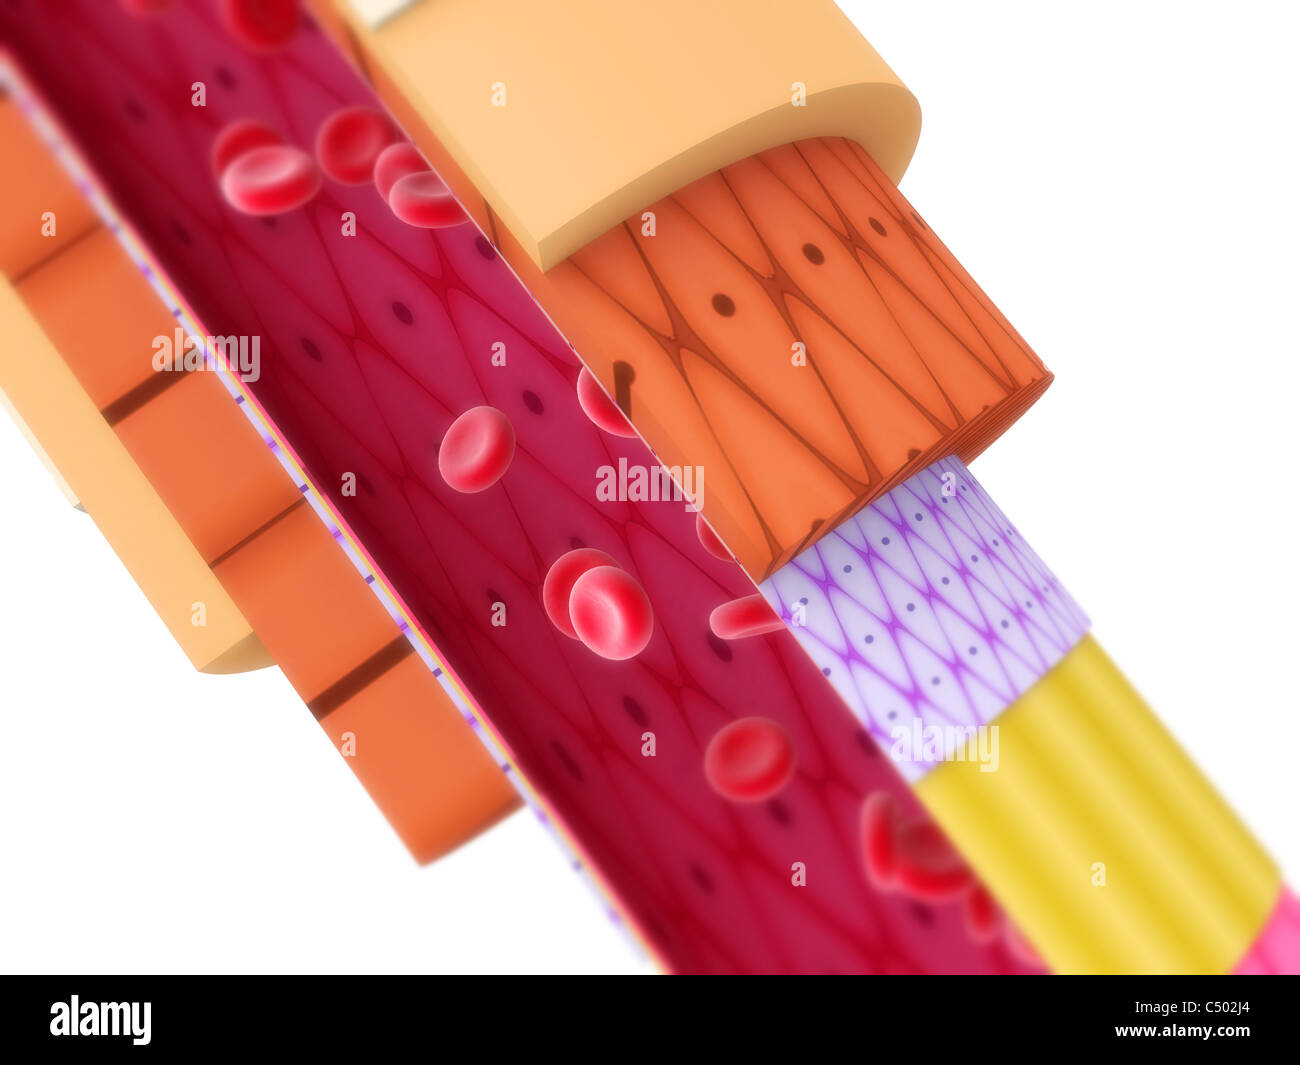 Artery cut off - Stock Image